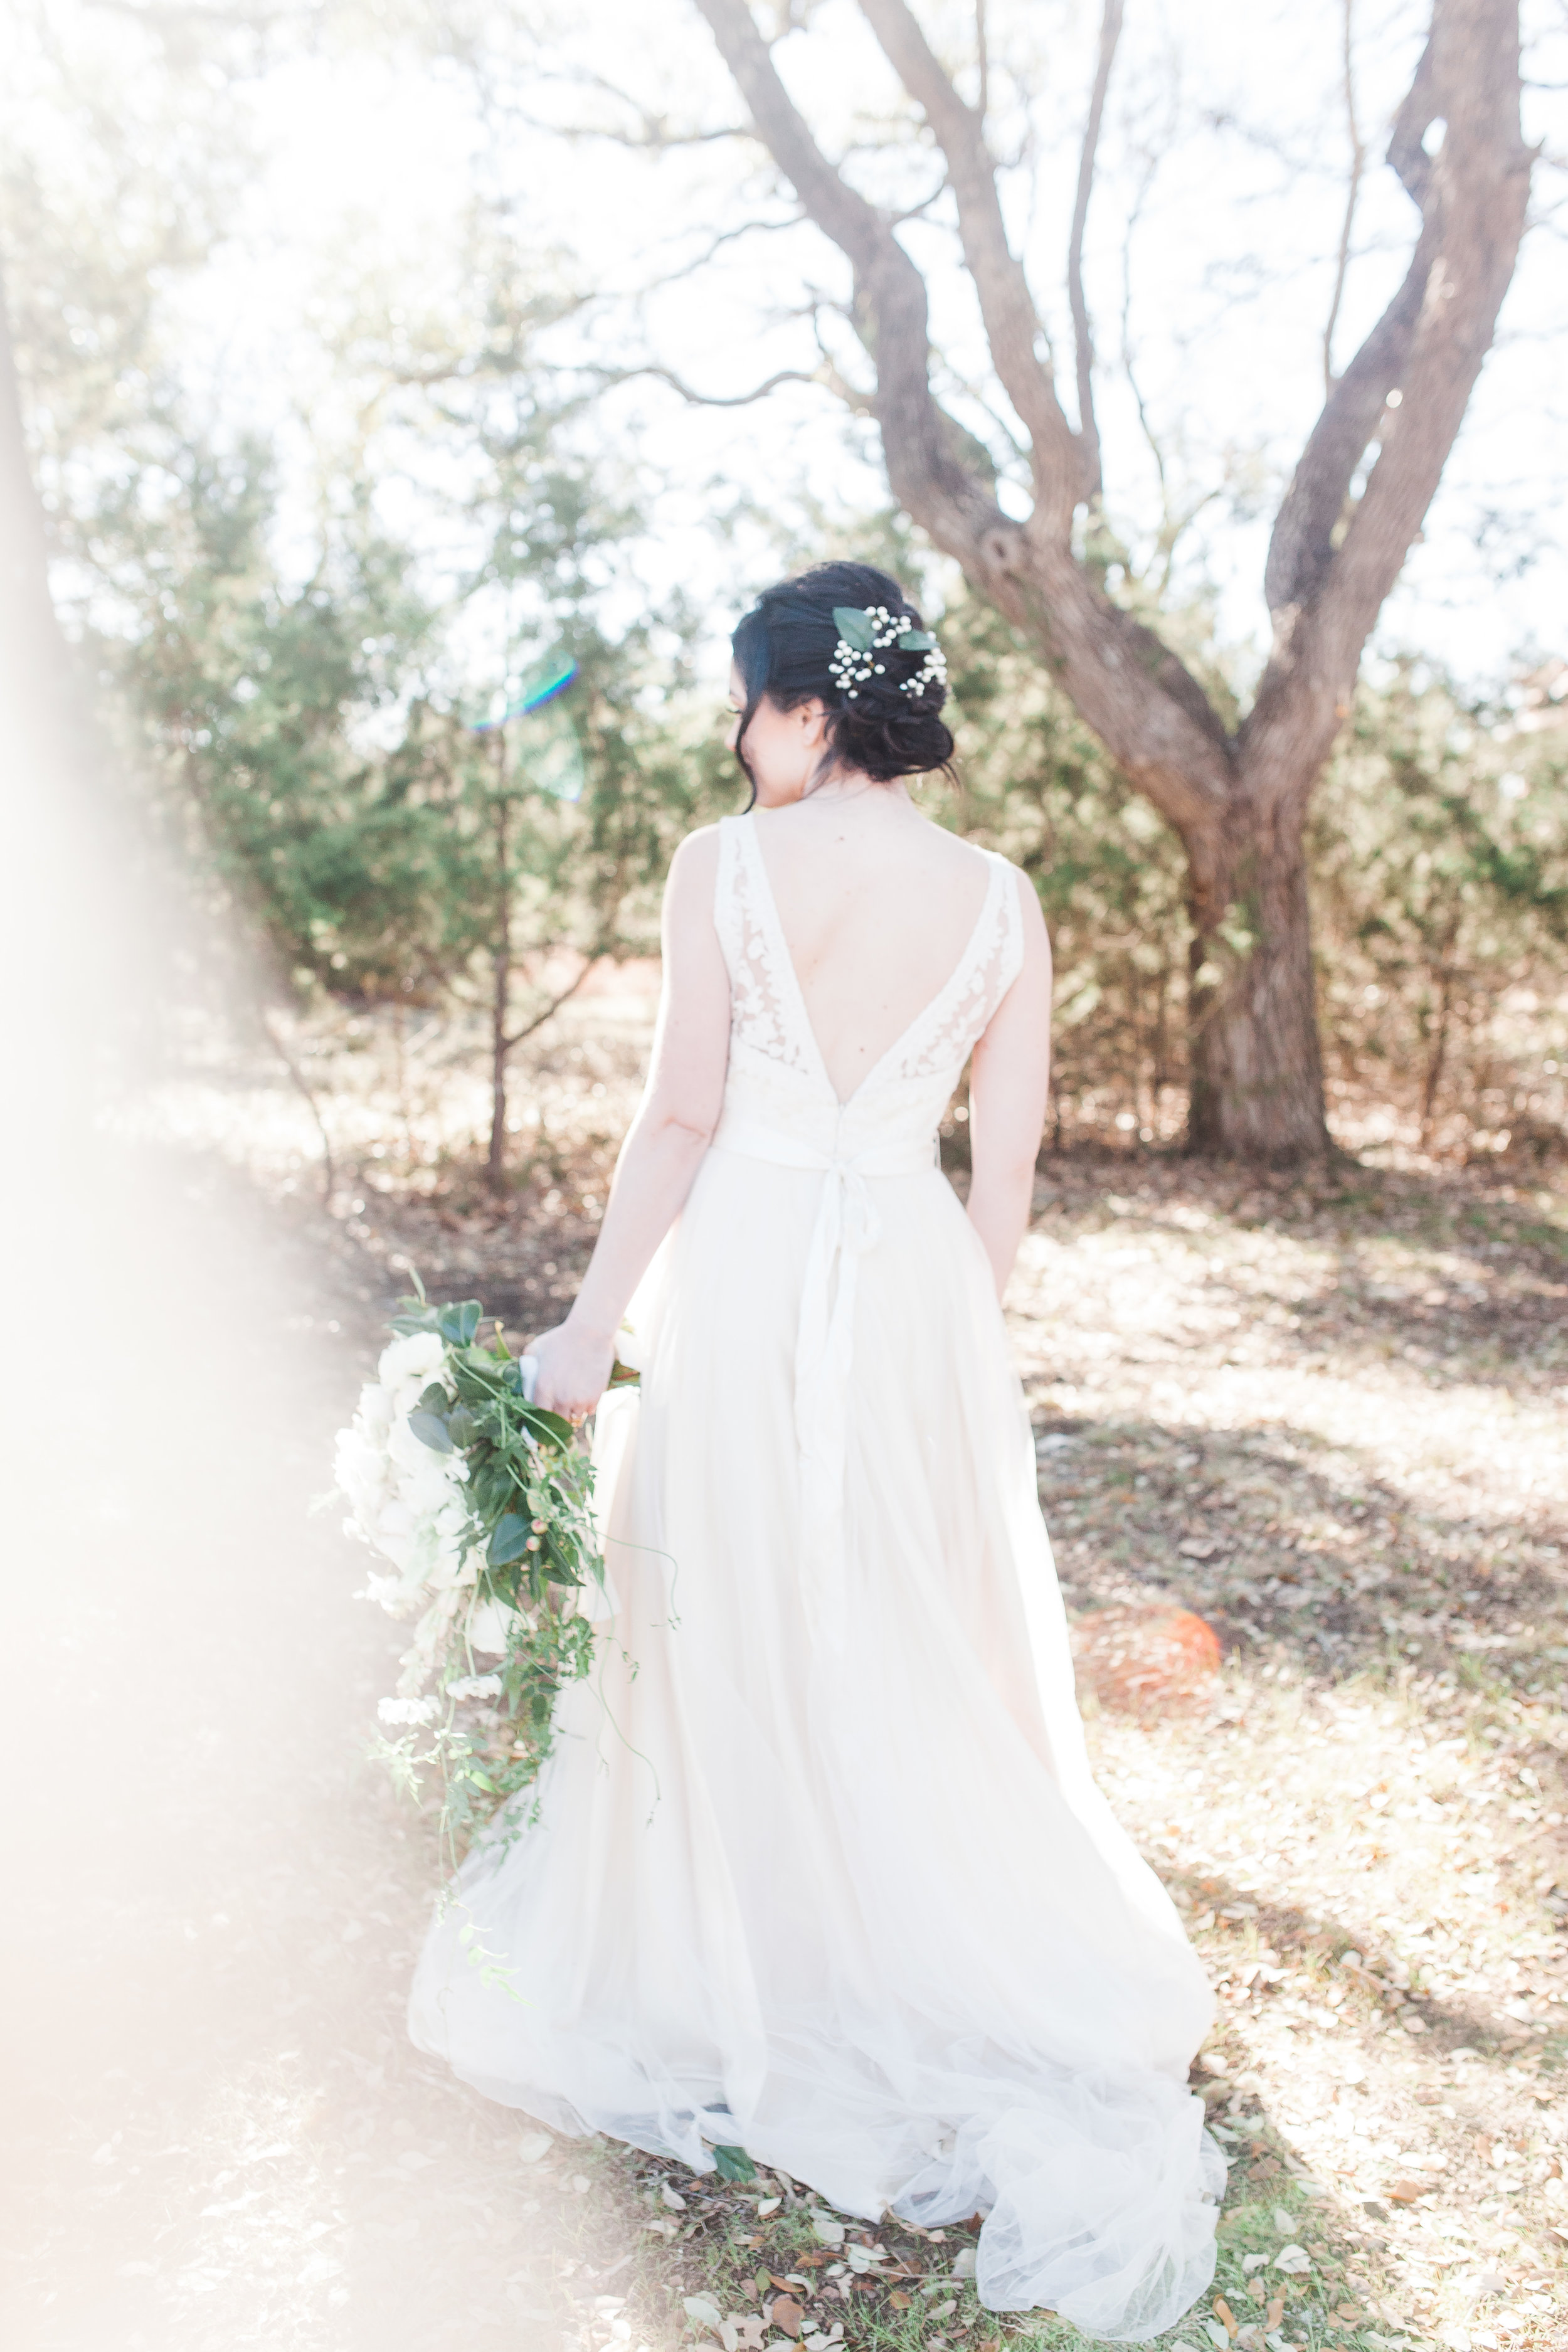 kindred oaks styled shoot austin texas wedding photographer-17.jpg